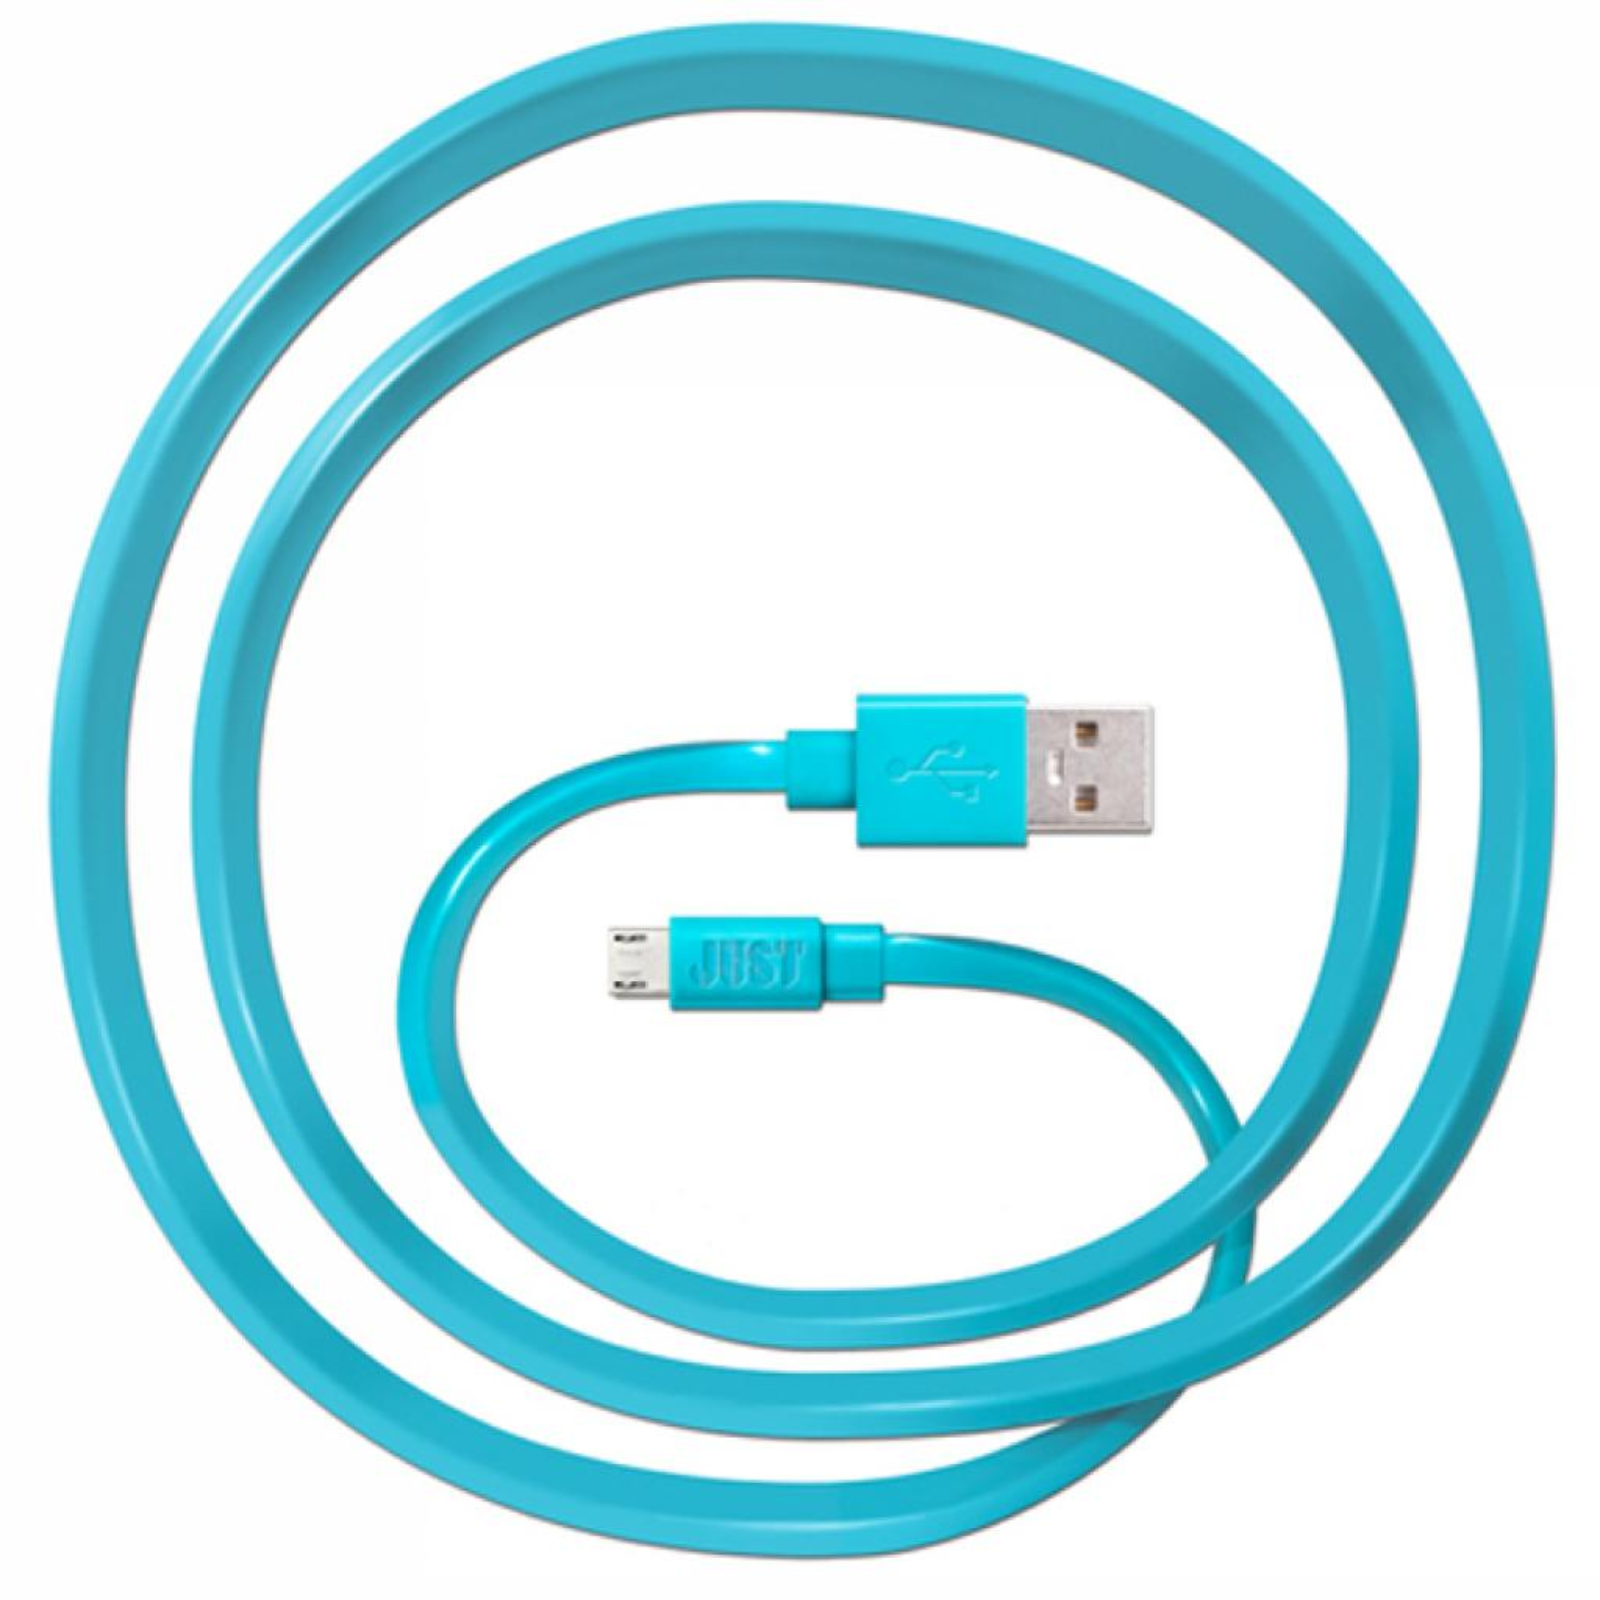 Дата кабель JUST Freedom Micro USB Cable Blue (MCR-FRDM-BL) изображение 2